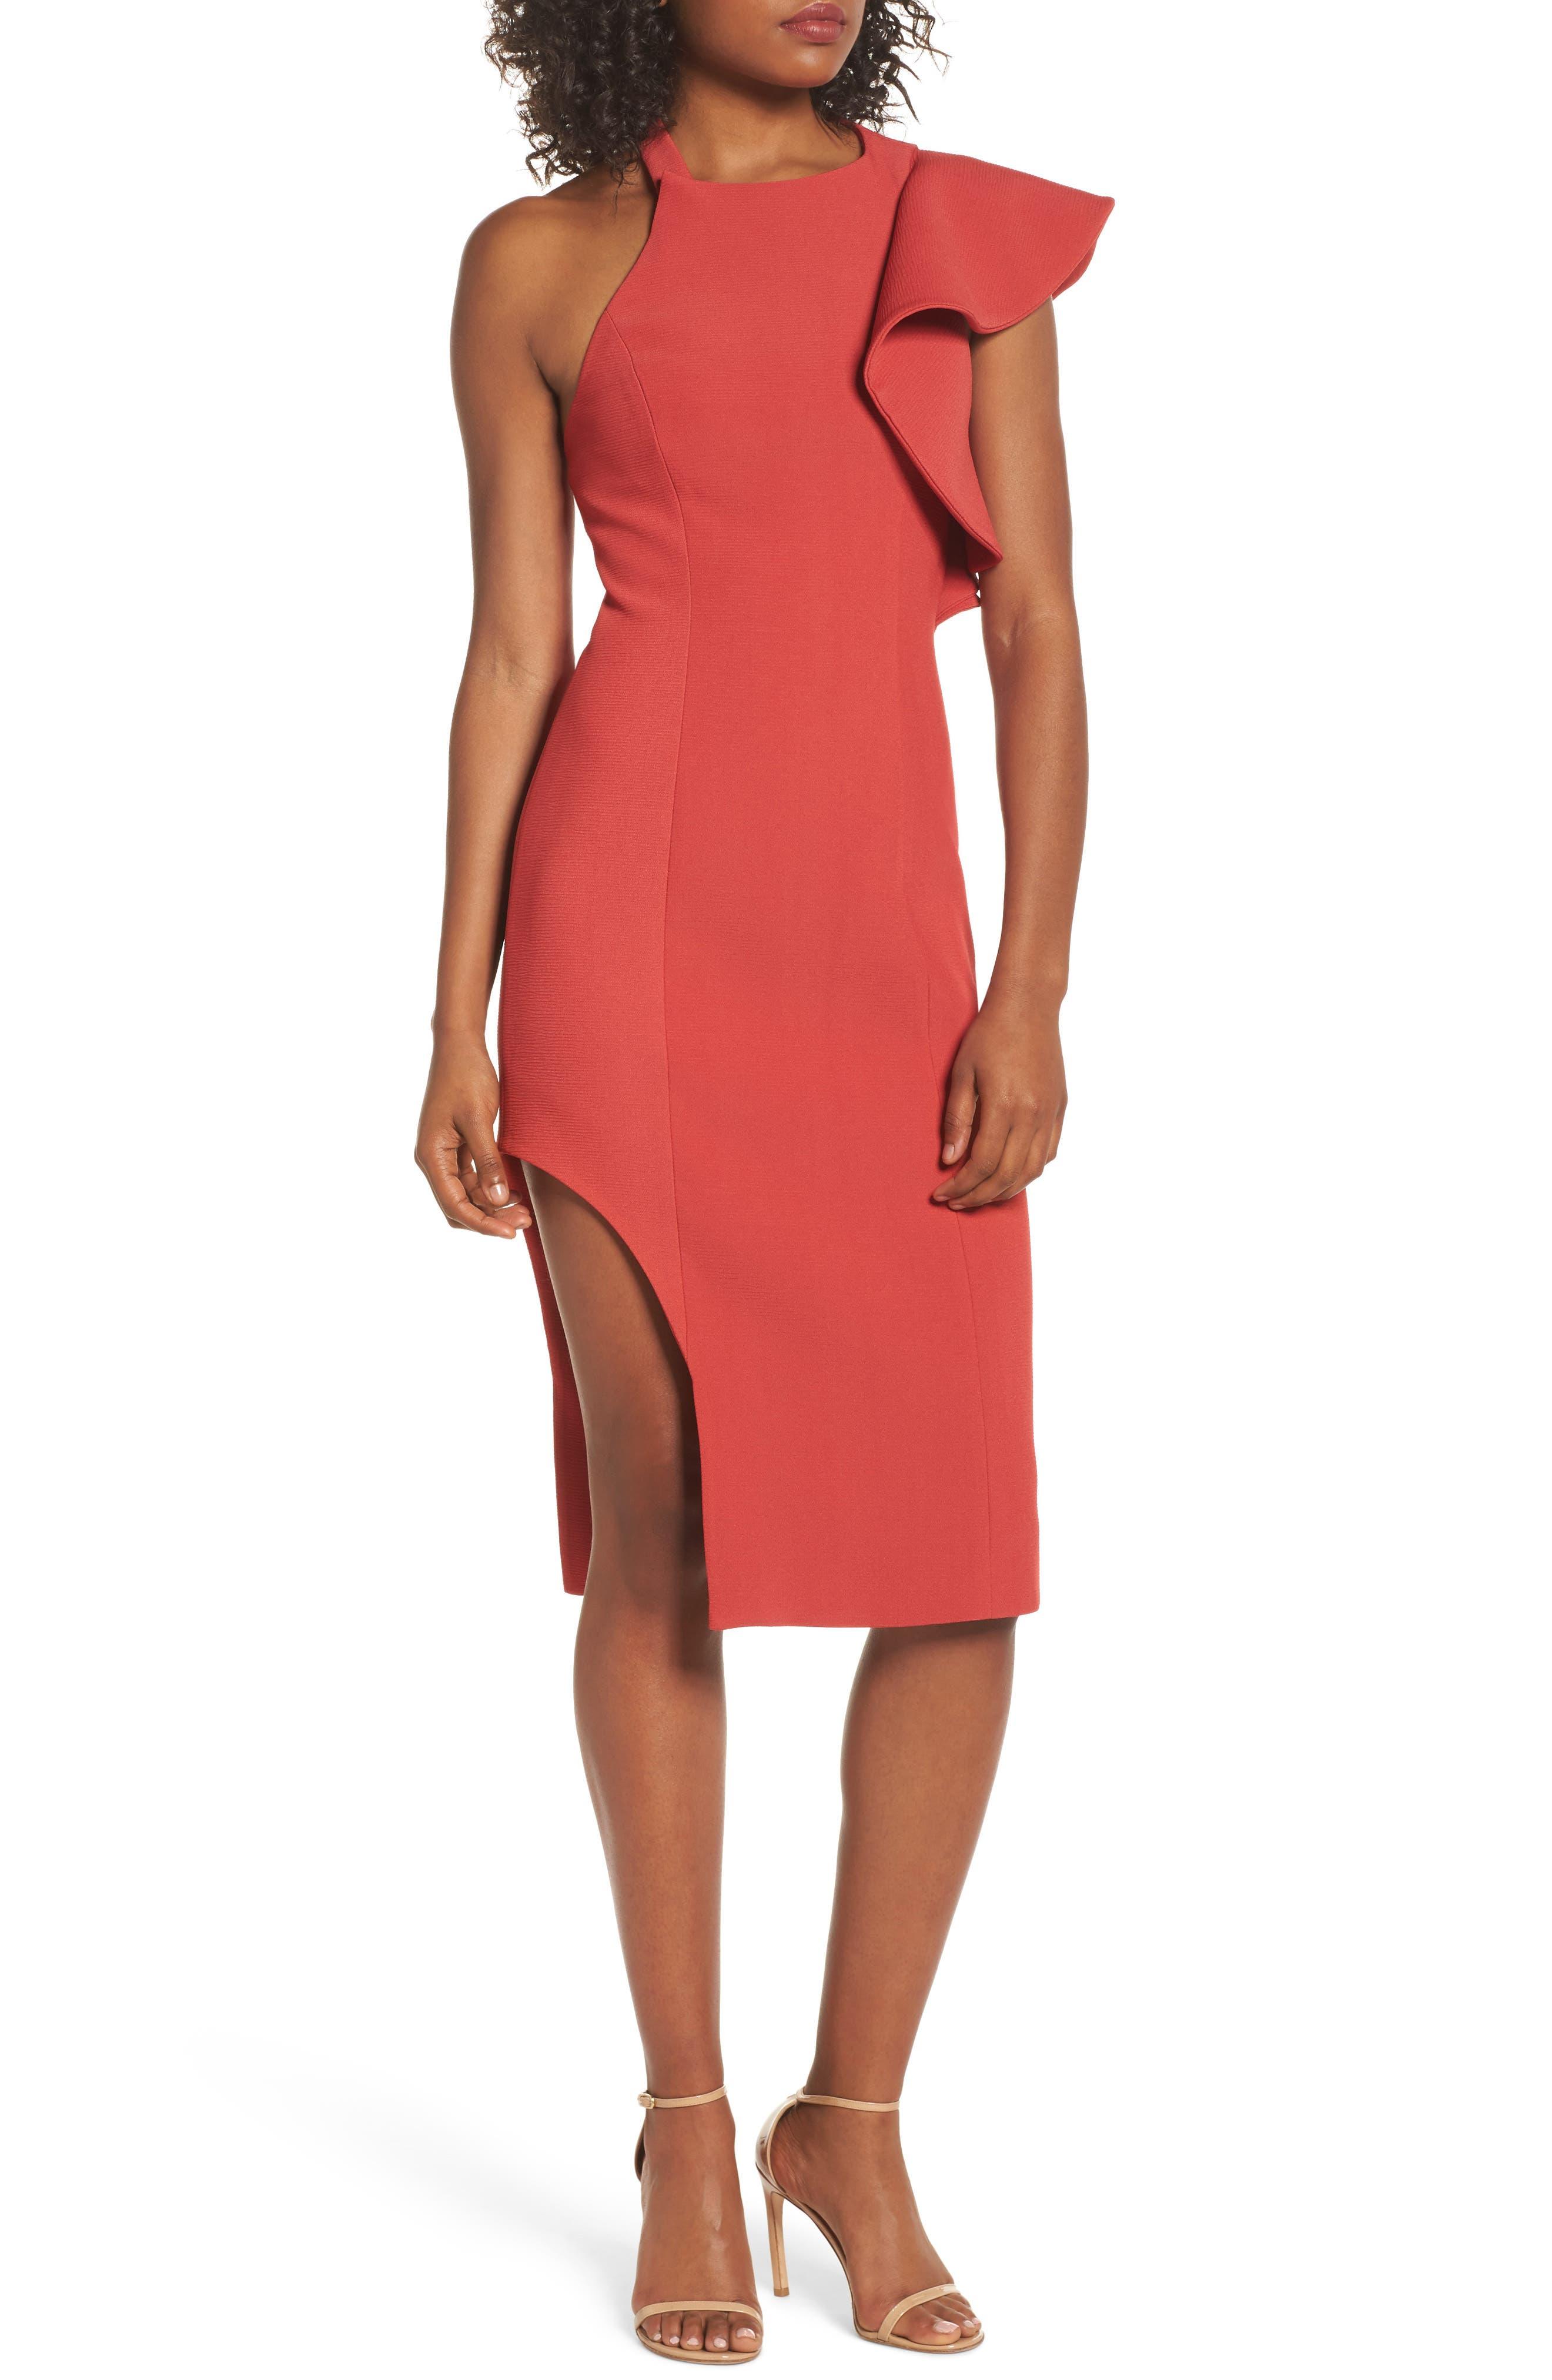 C/MEO Collective Infinite Asymmetrical Dress